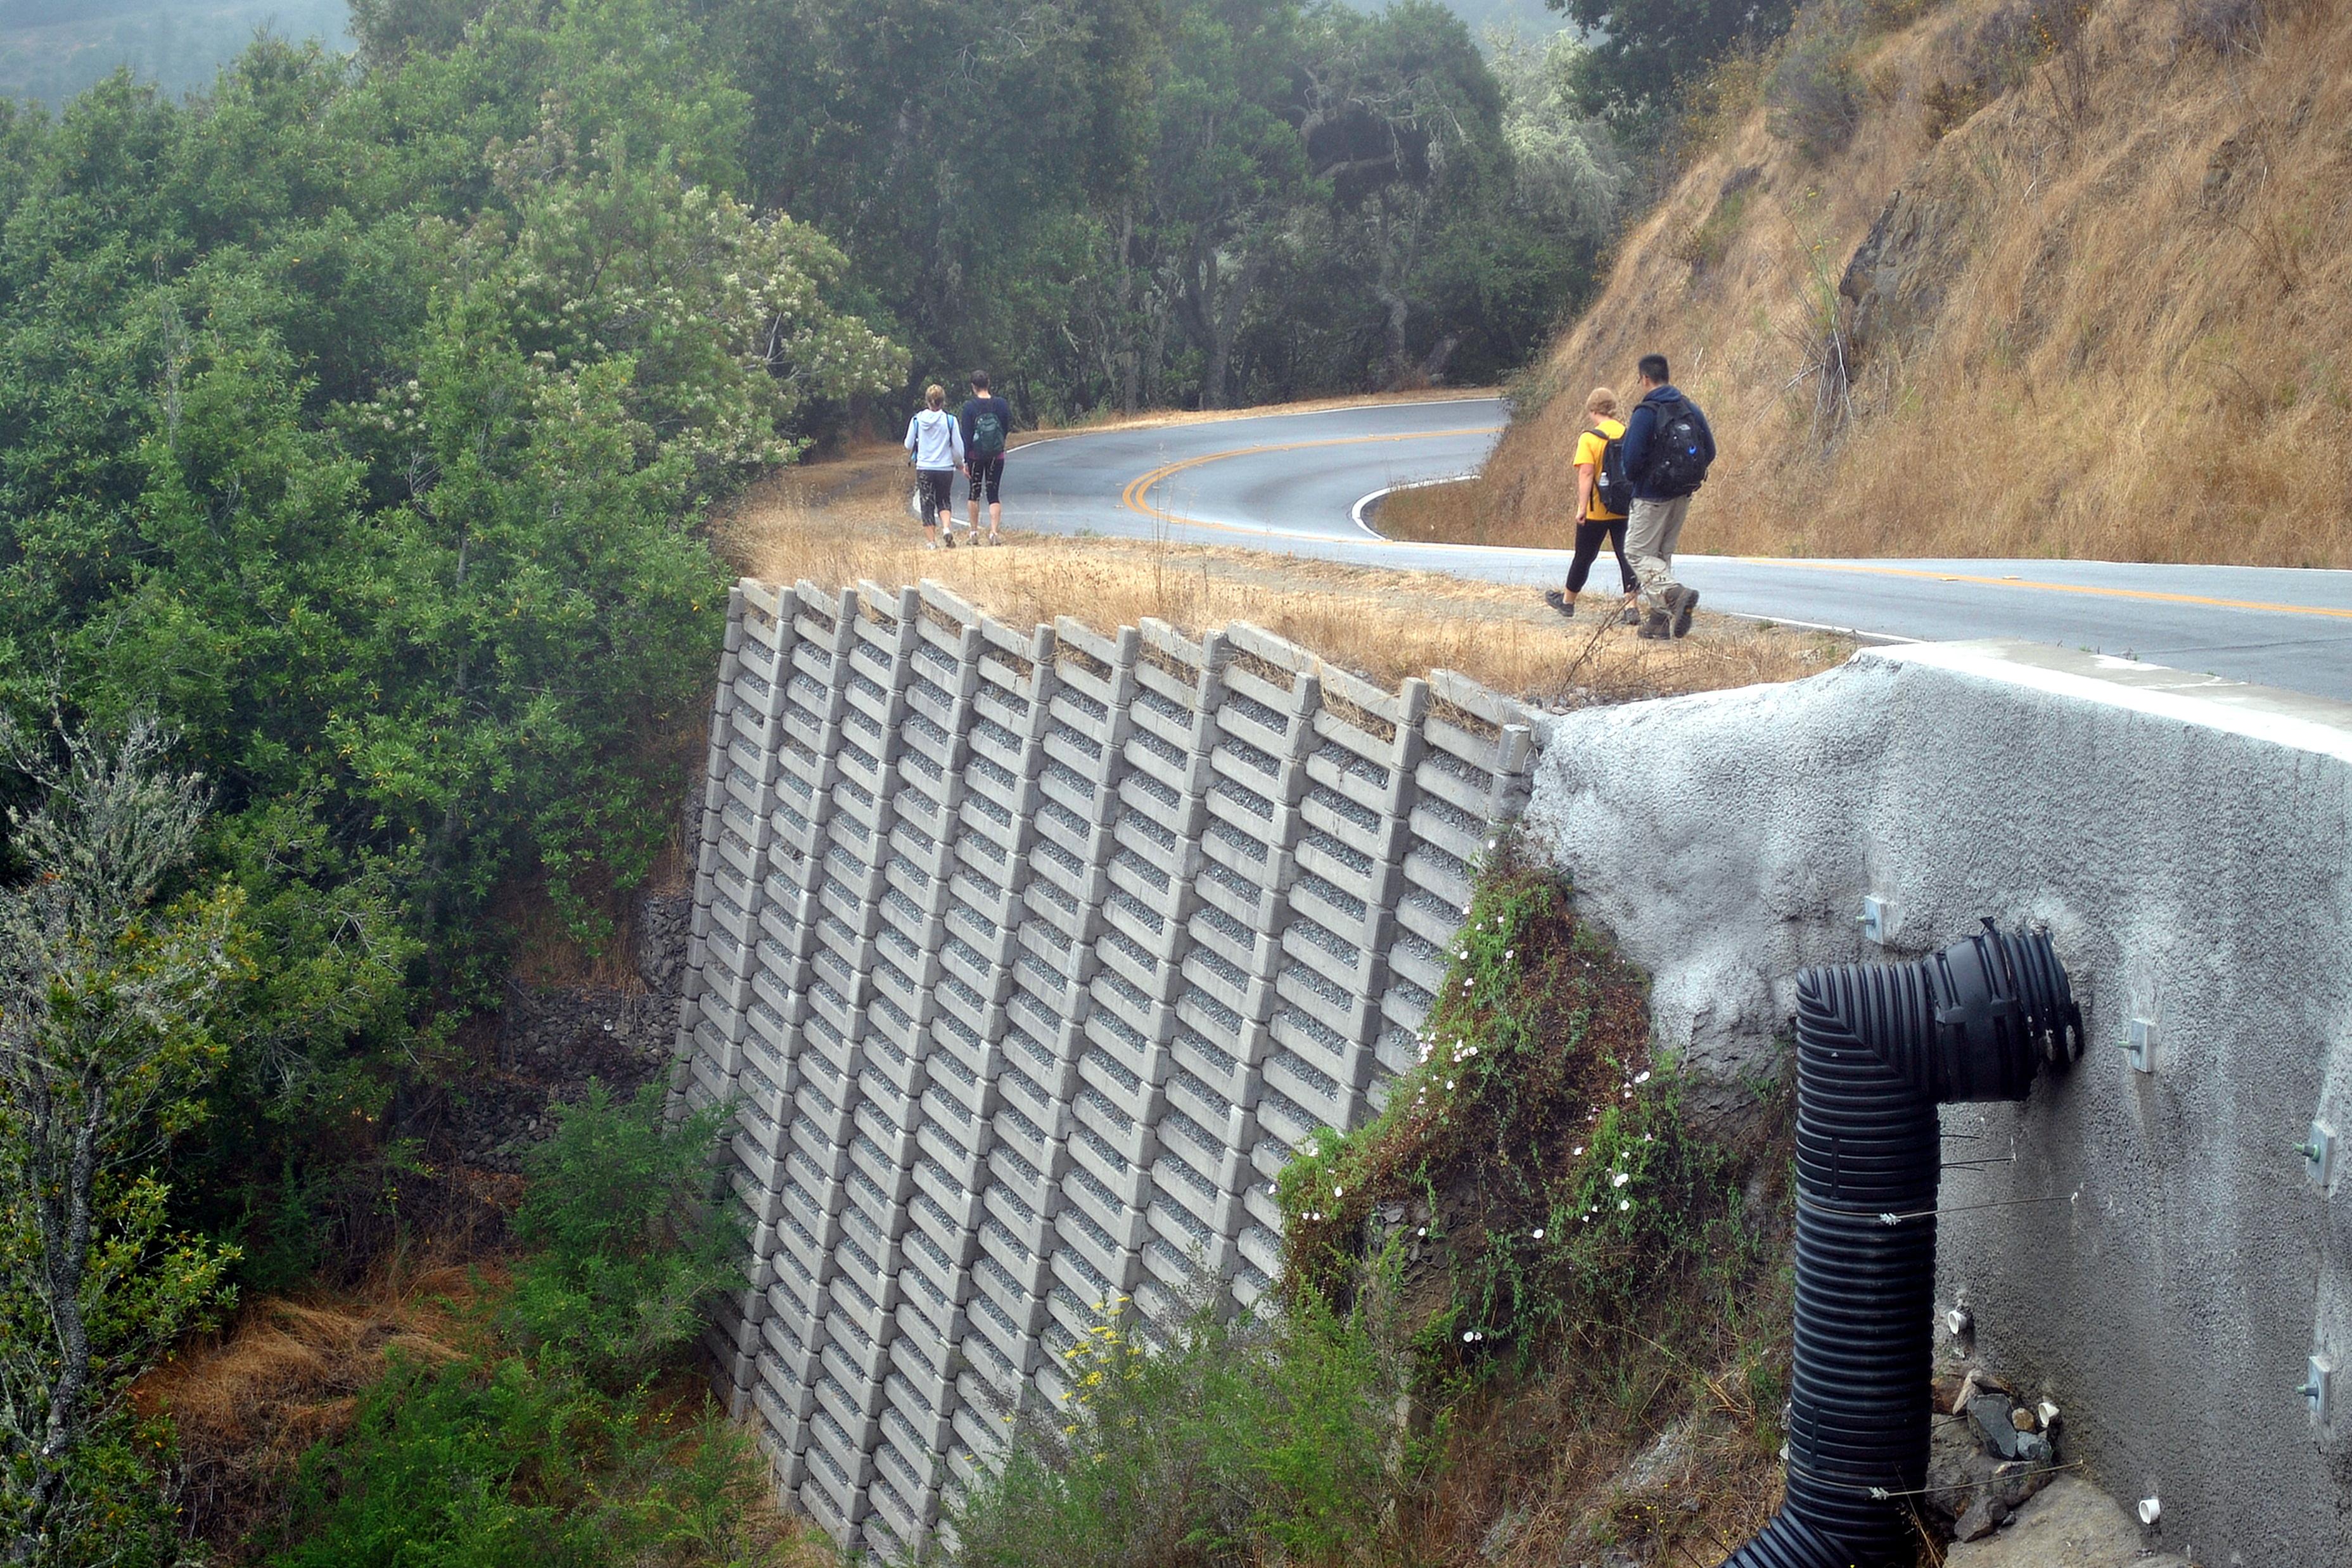 File:Crib wall.JPG - Wikimedia Commons